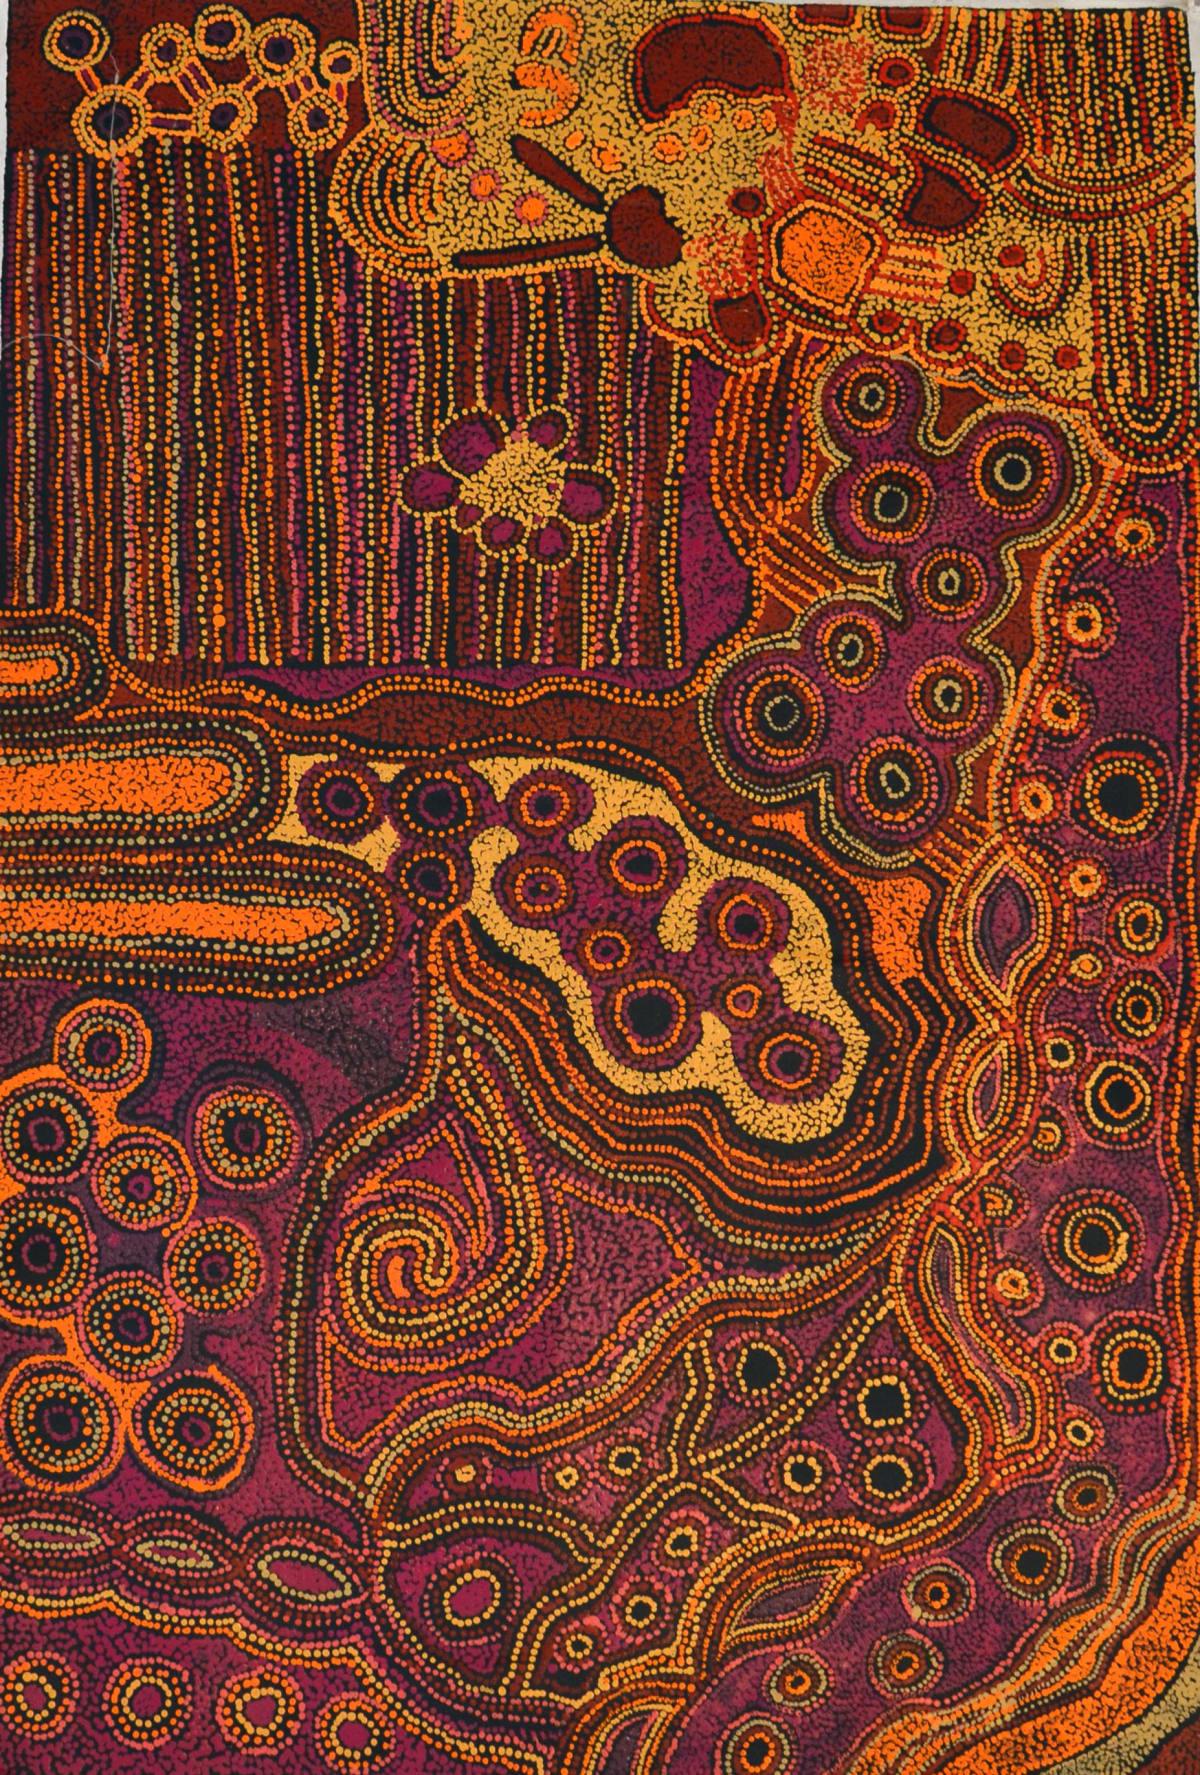 Kani Patricia Tunkin Malilu Tjukurpa acrylic on linen 100 x 150 cm